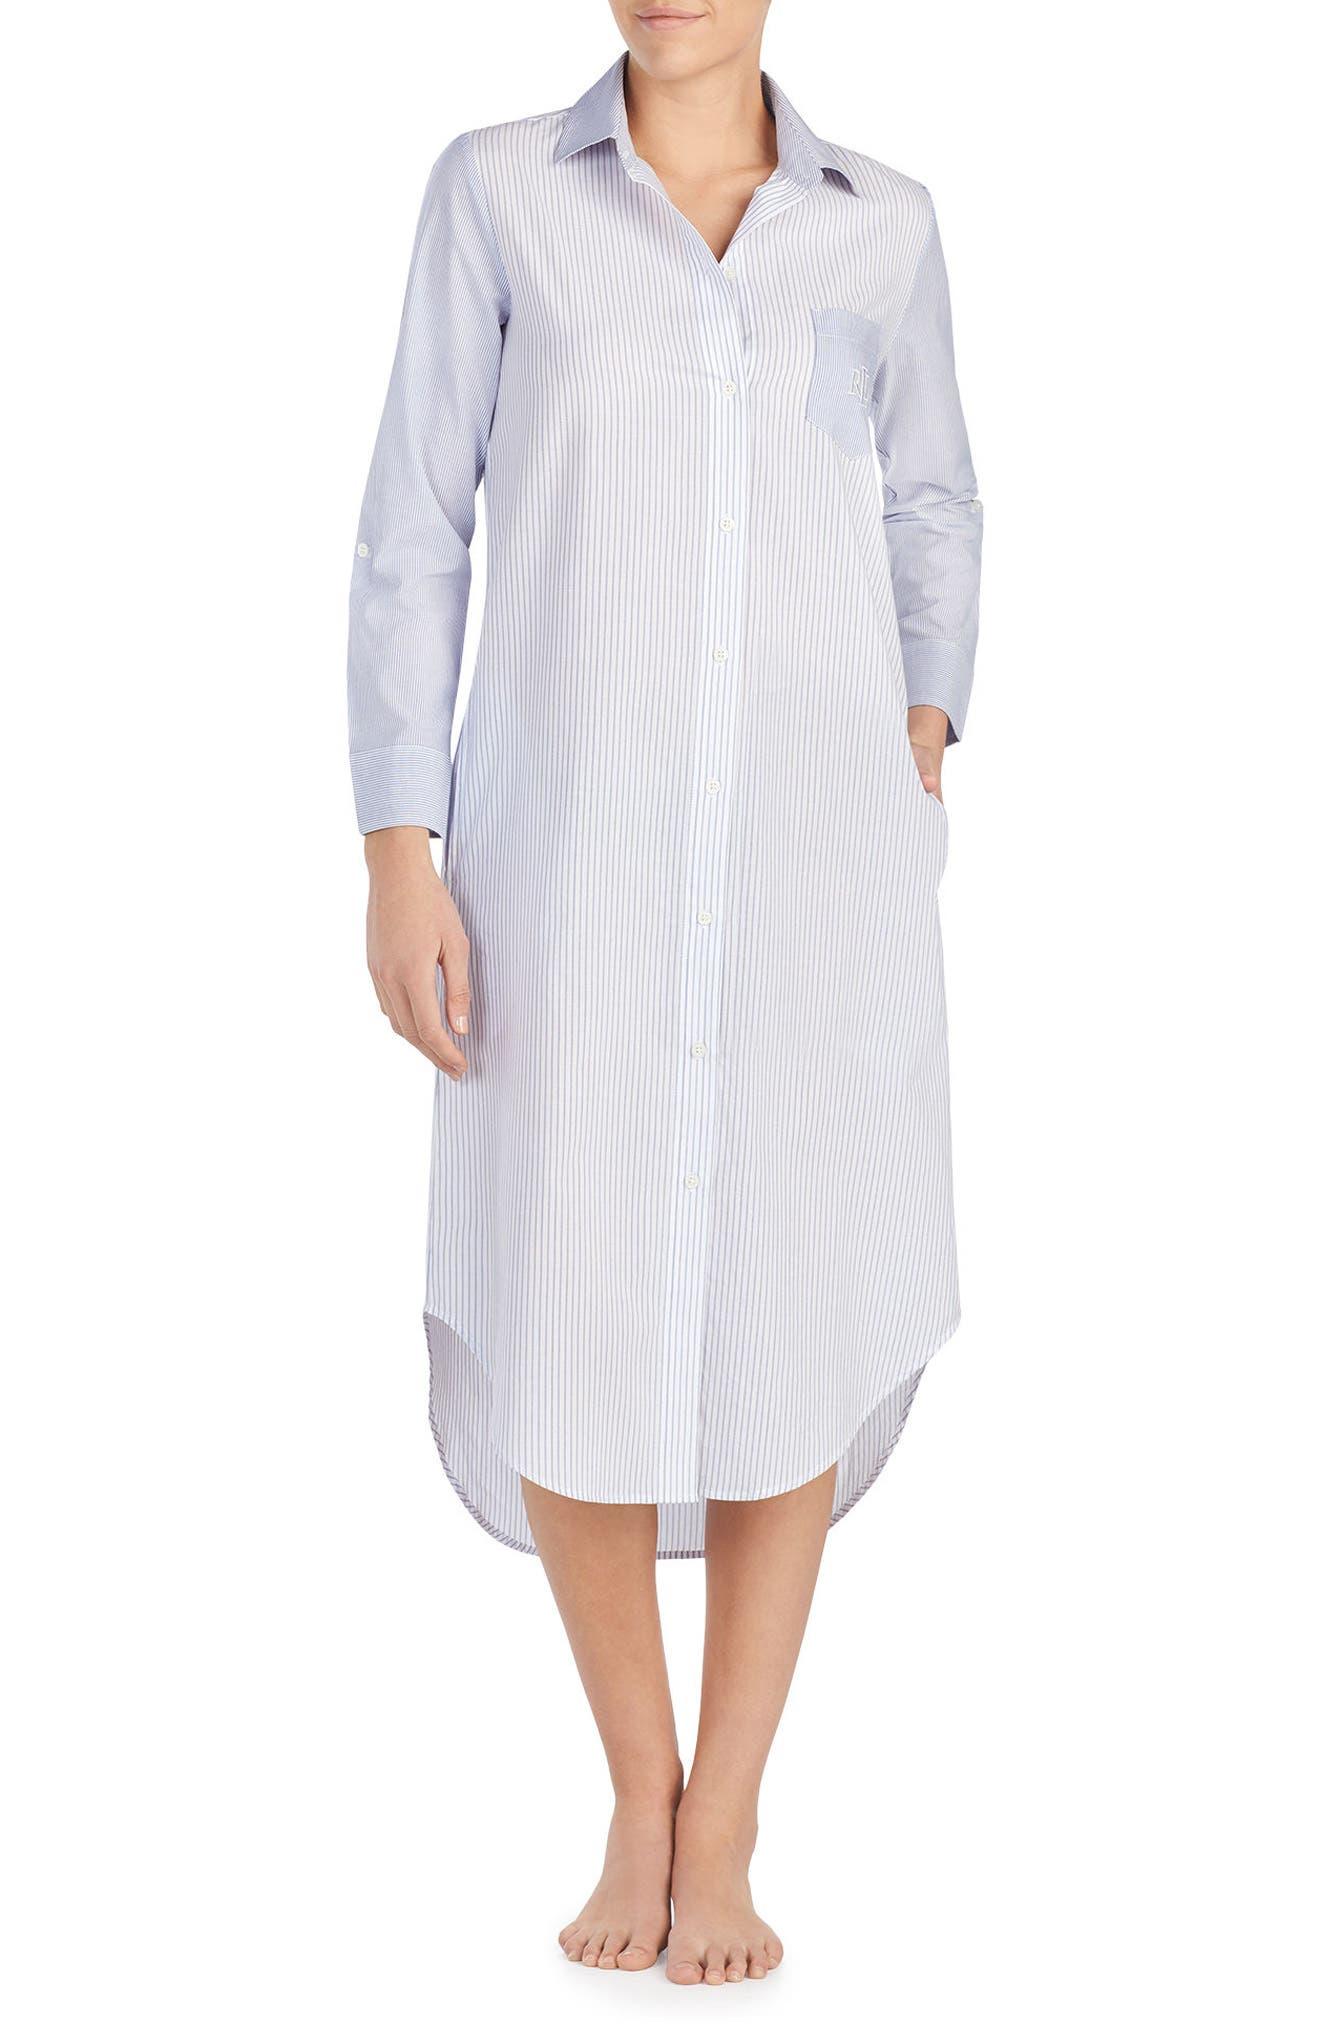 Sleep Shirt,                         Main,                         color, WHITE STRIPE